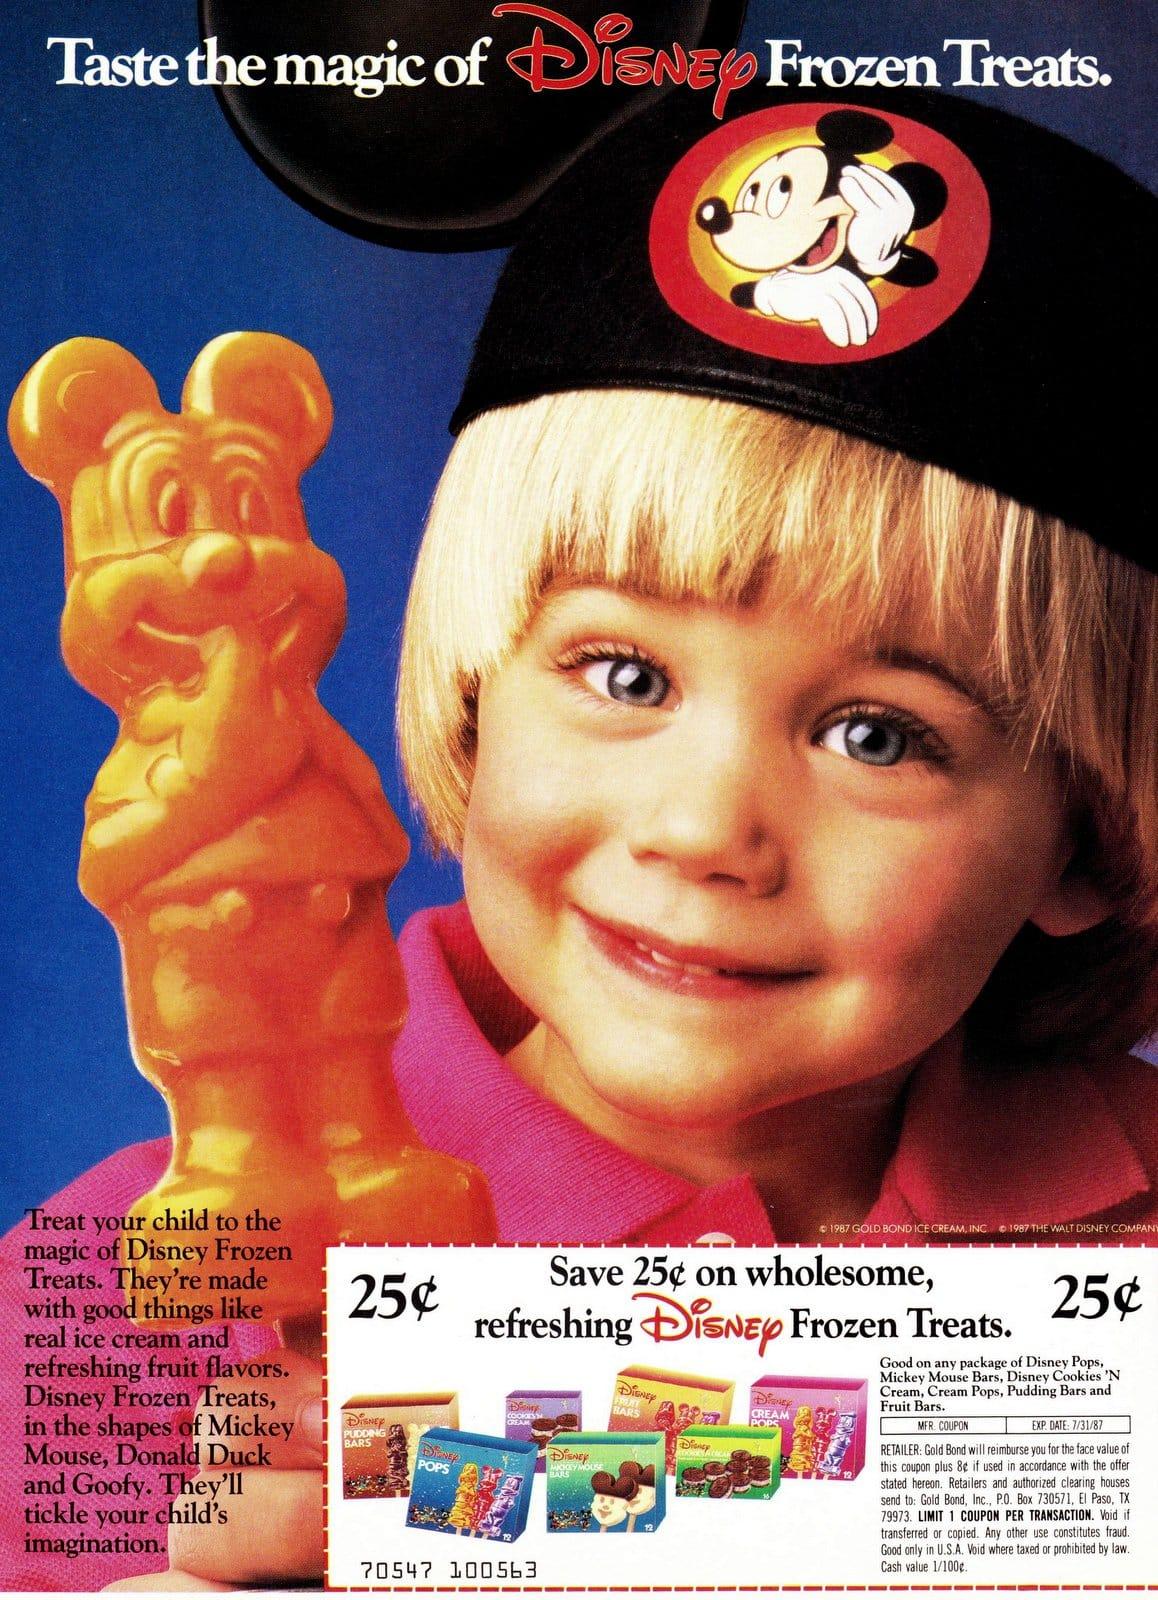 Vintage Disney shaped frozen treats (1987)